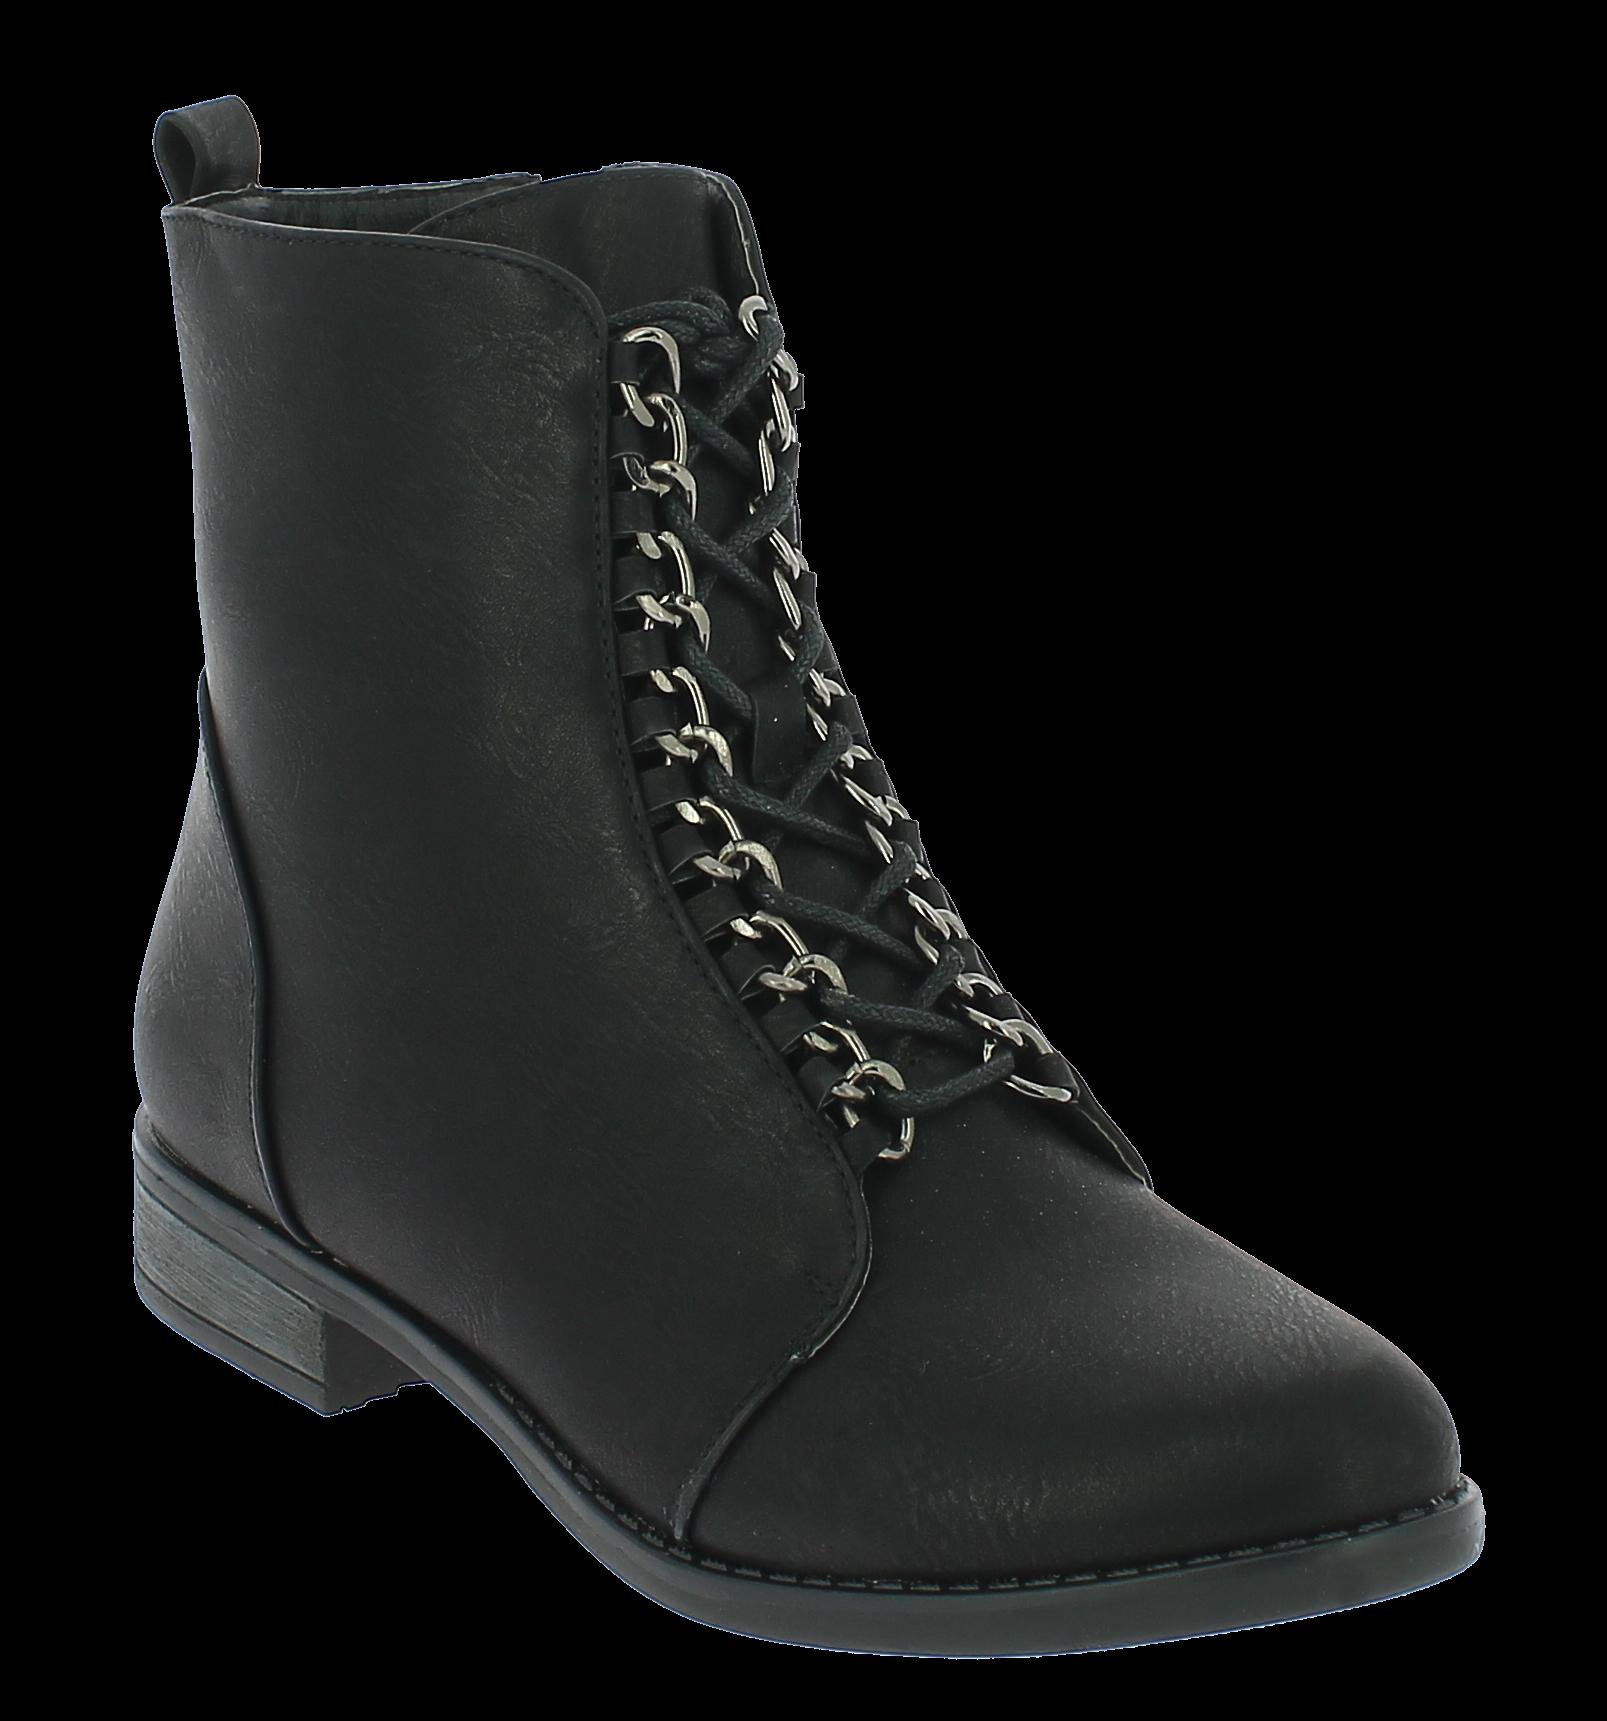 IQSHOES Γυναικείο Μποτάκι HI37 Μαύρο - IqShoes - HI-37 BLACK-black-37/1/15/27 παπούτσια  new in